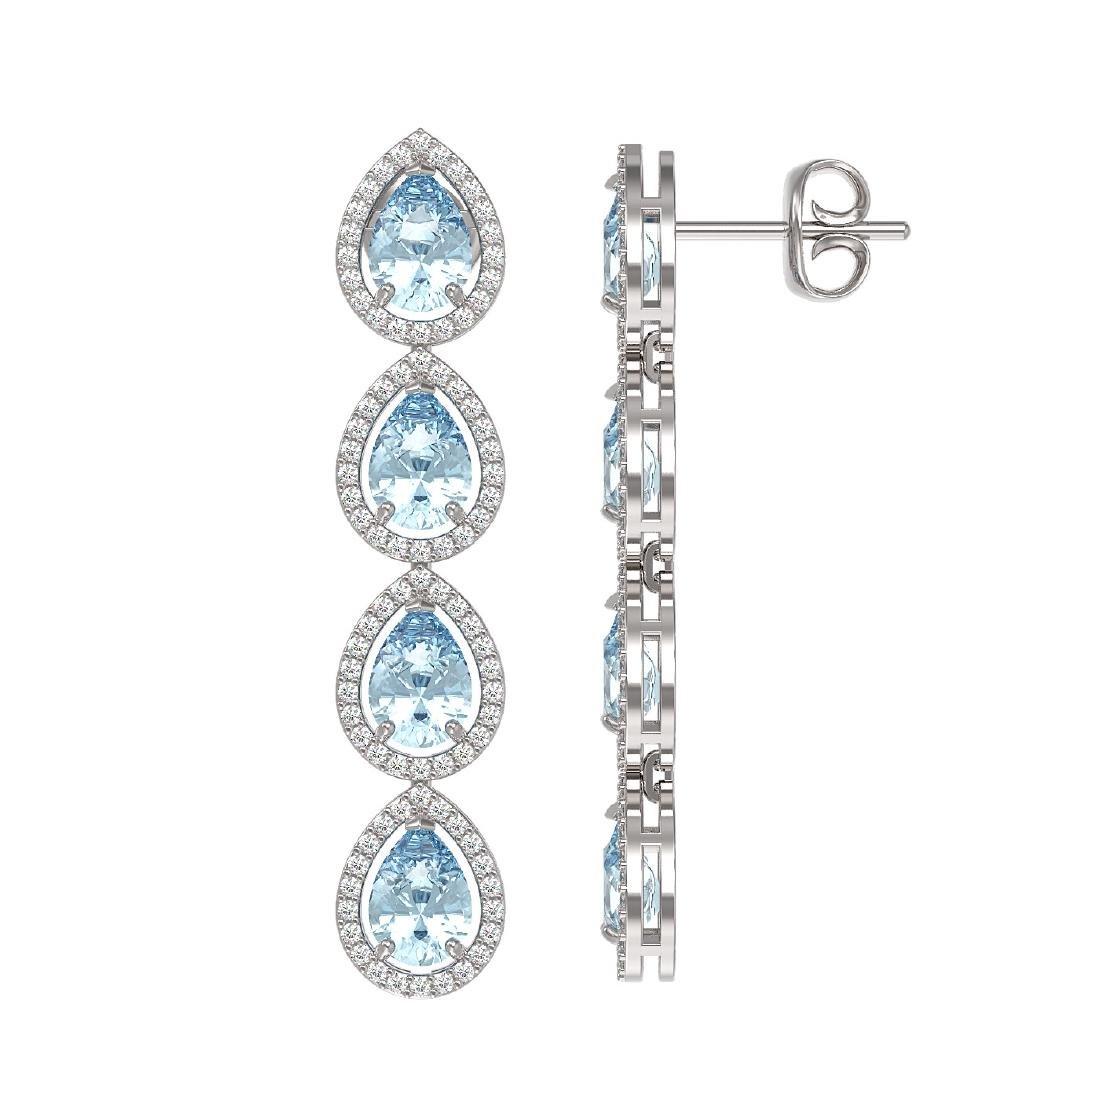 7.41 CTW Aquamarine & Diamond Halo Earrings 10K White - 2